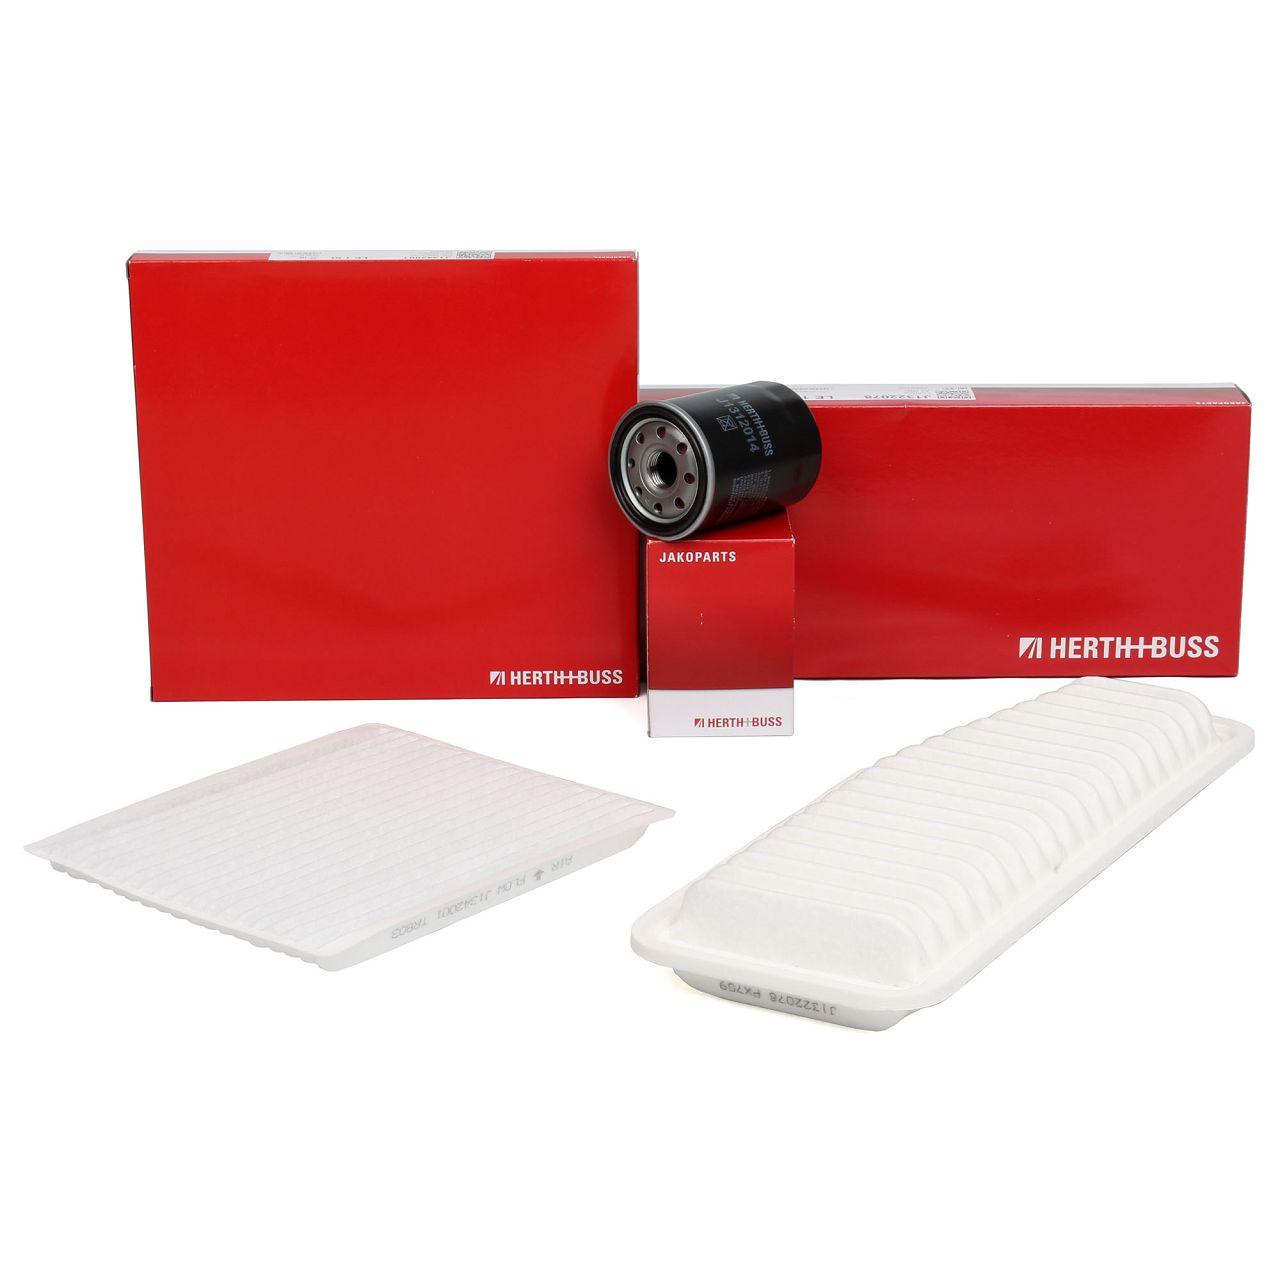 HERTH+BUSS JAKOPARTS Filterpaket Filterset für TOYOTA RAV 4 II 2.0/2.4 VVTi 4WD